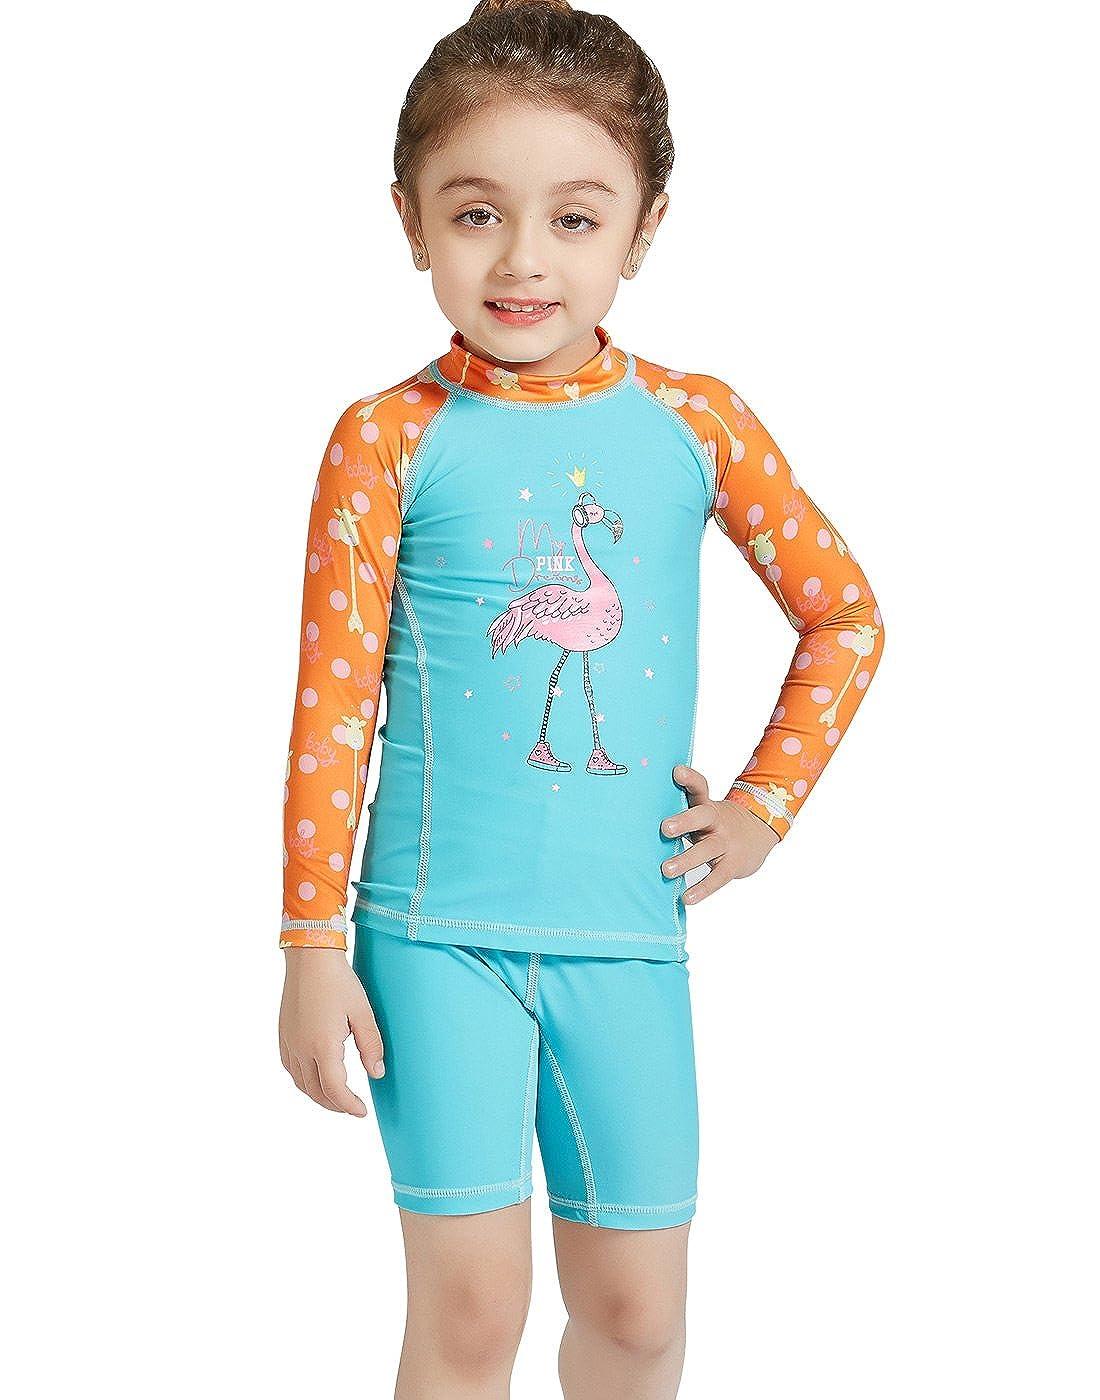 DIVE/&SAIL Girls Long Sleeve Rashguard with Shorts Set 2-Piece Swimwear 4-9Y